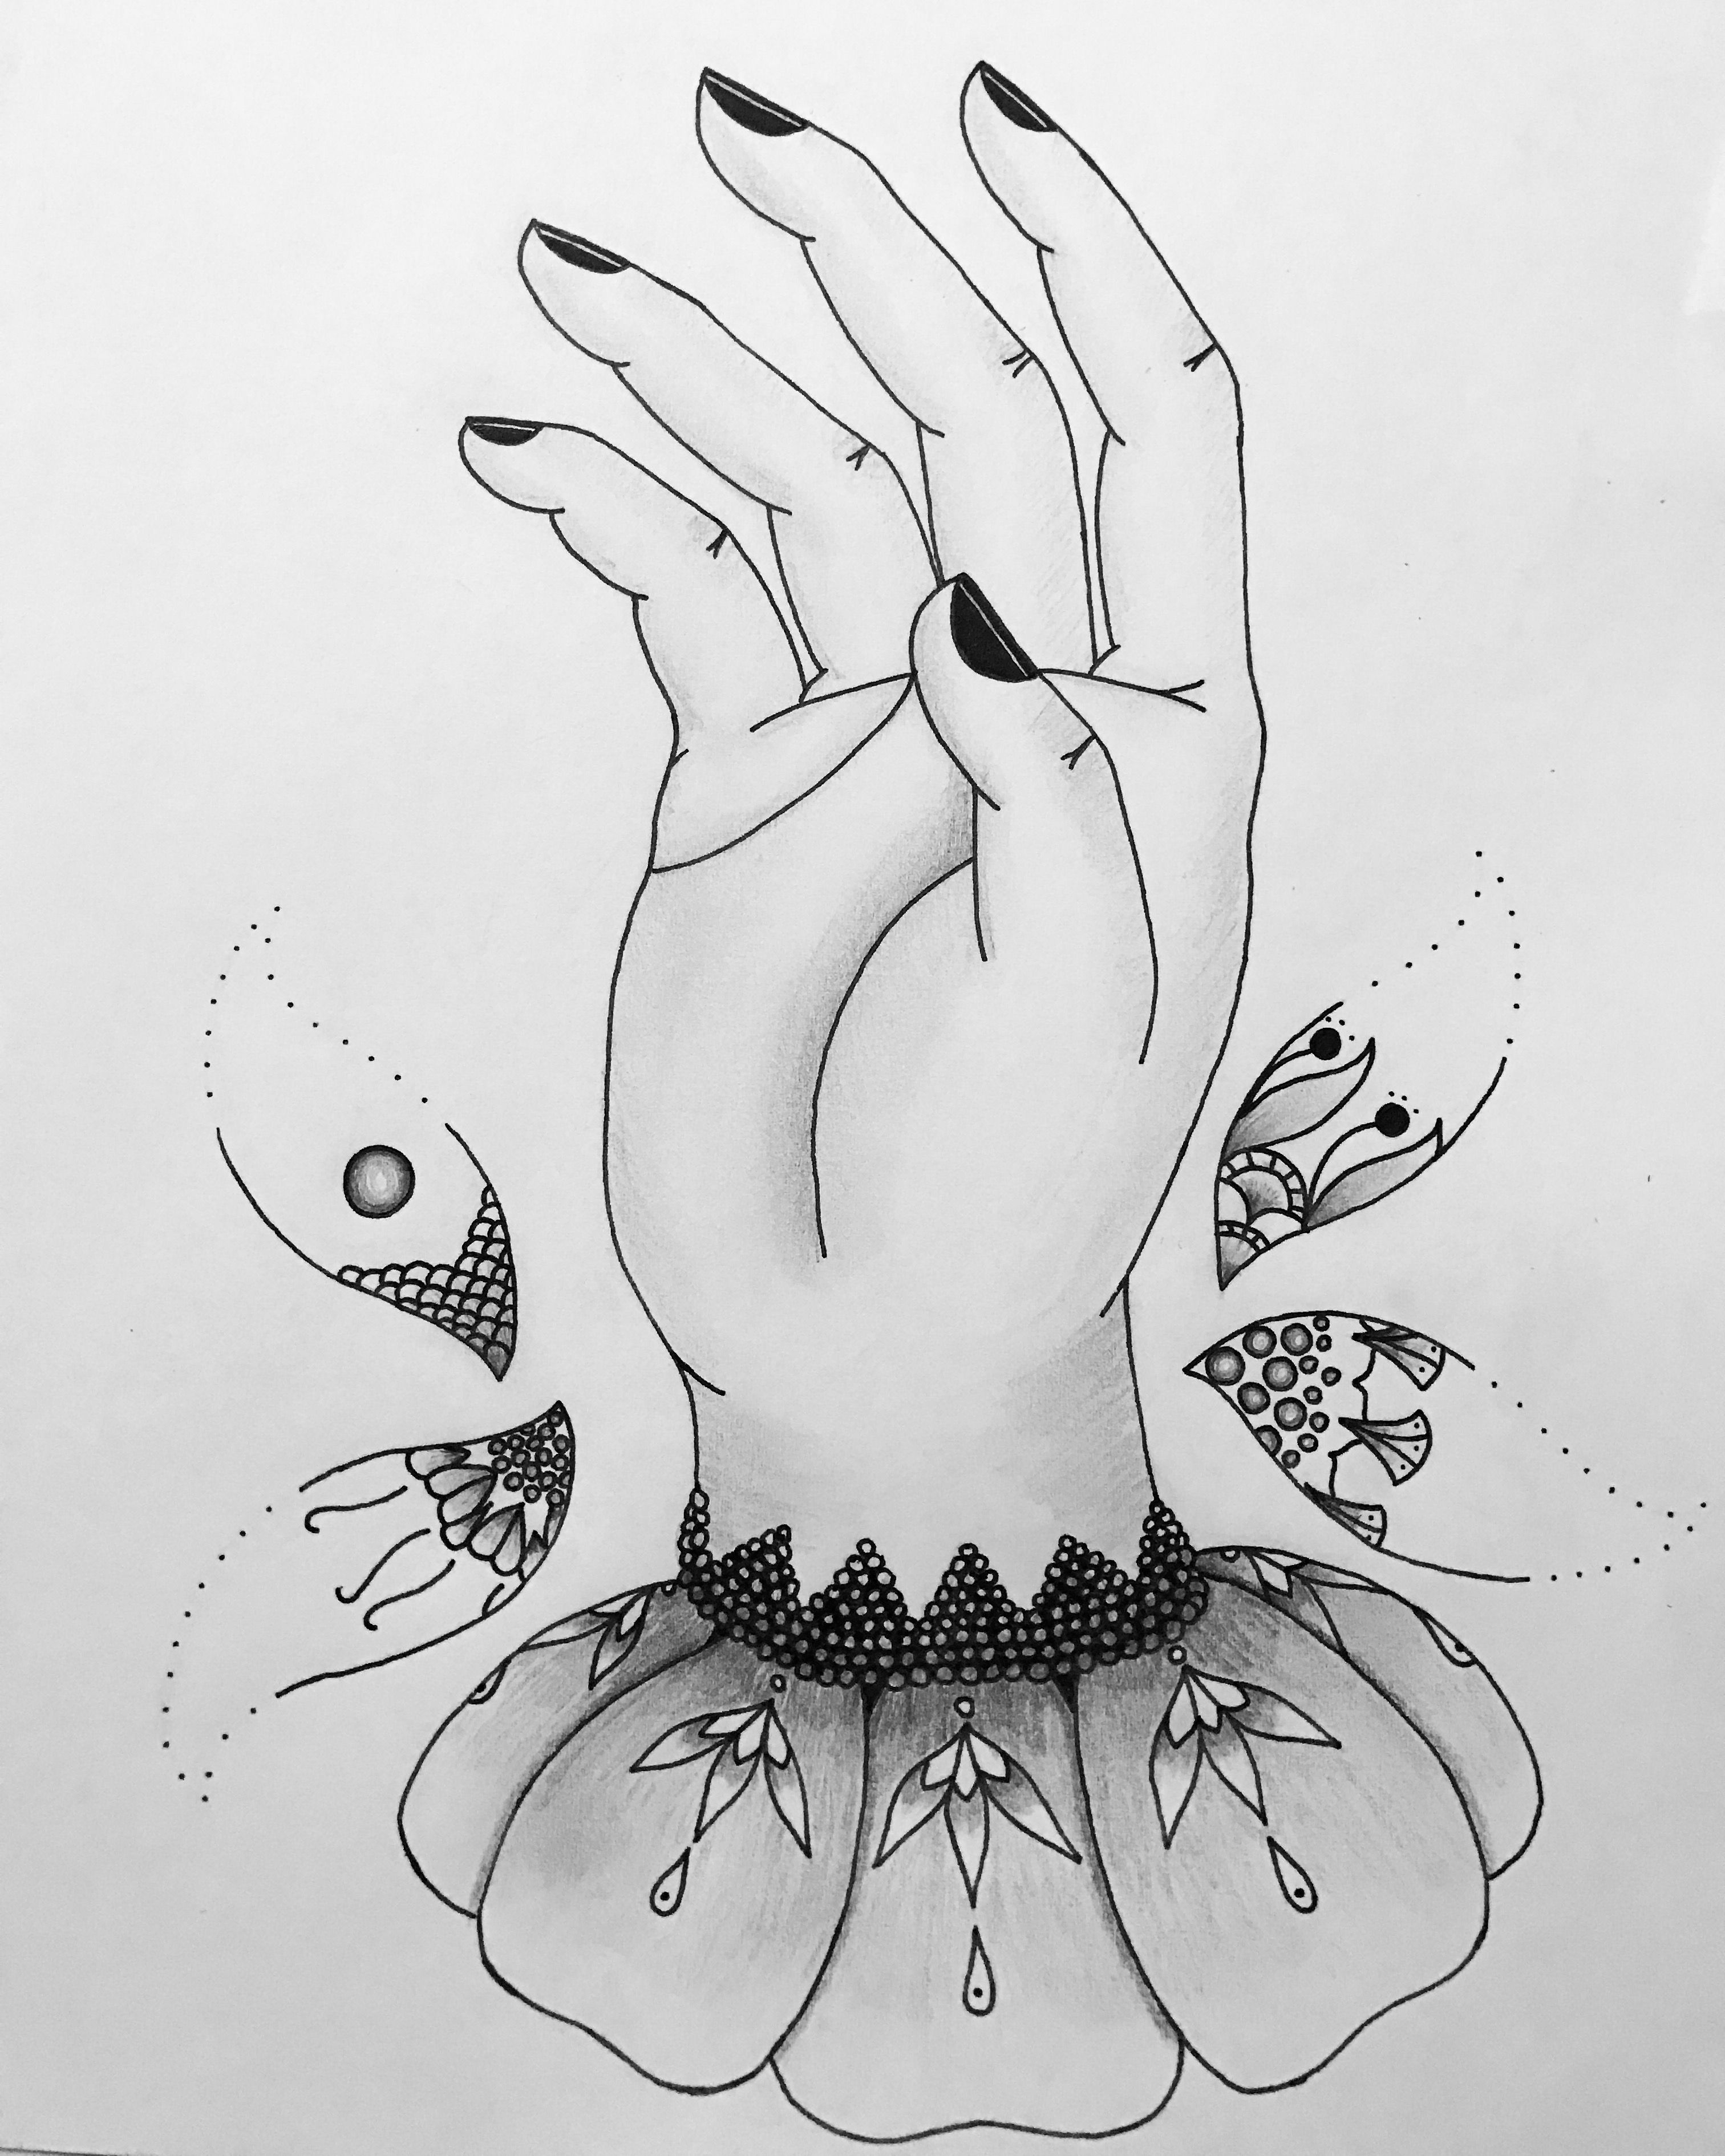 Moon Flowers Woman Tattoo Design Available On Etsy Laurenceveillx Half Sleeve Tattoo Template Celestial Tattoo Tattoos For Women Half Sleeve